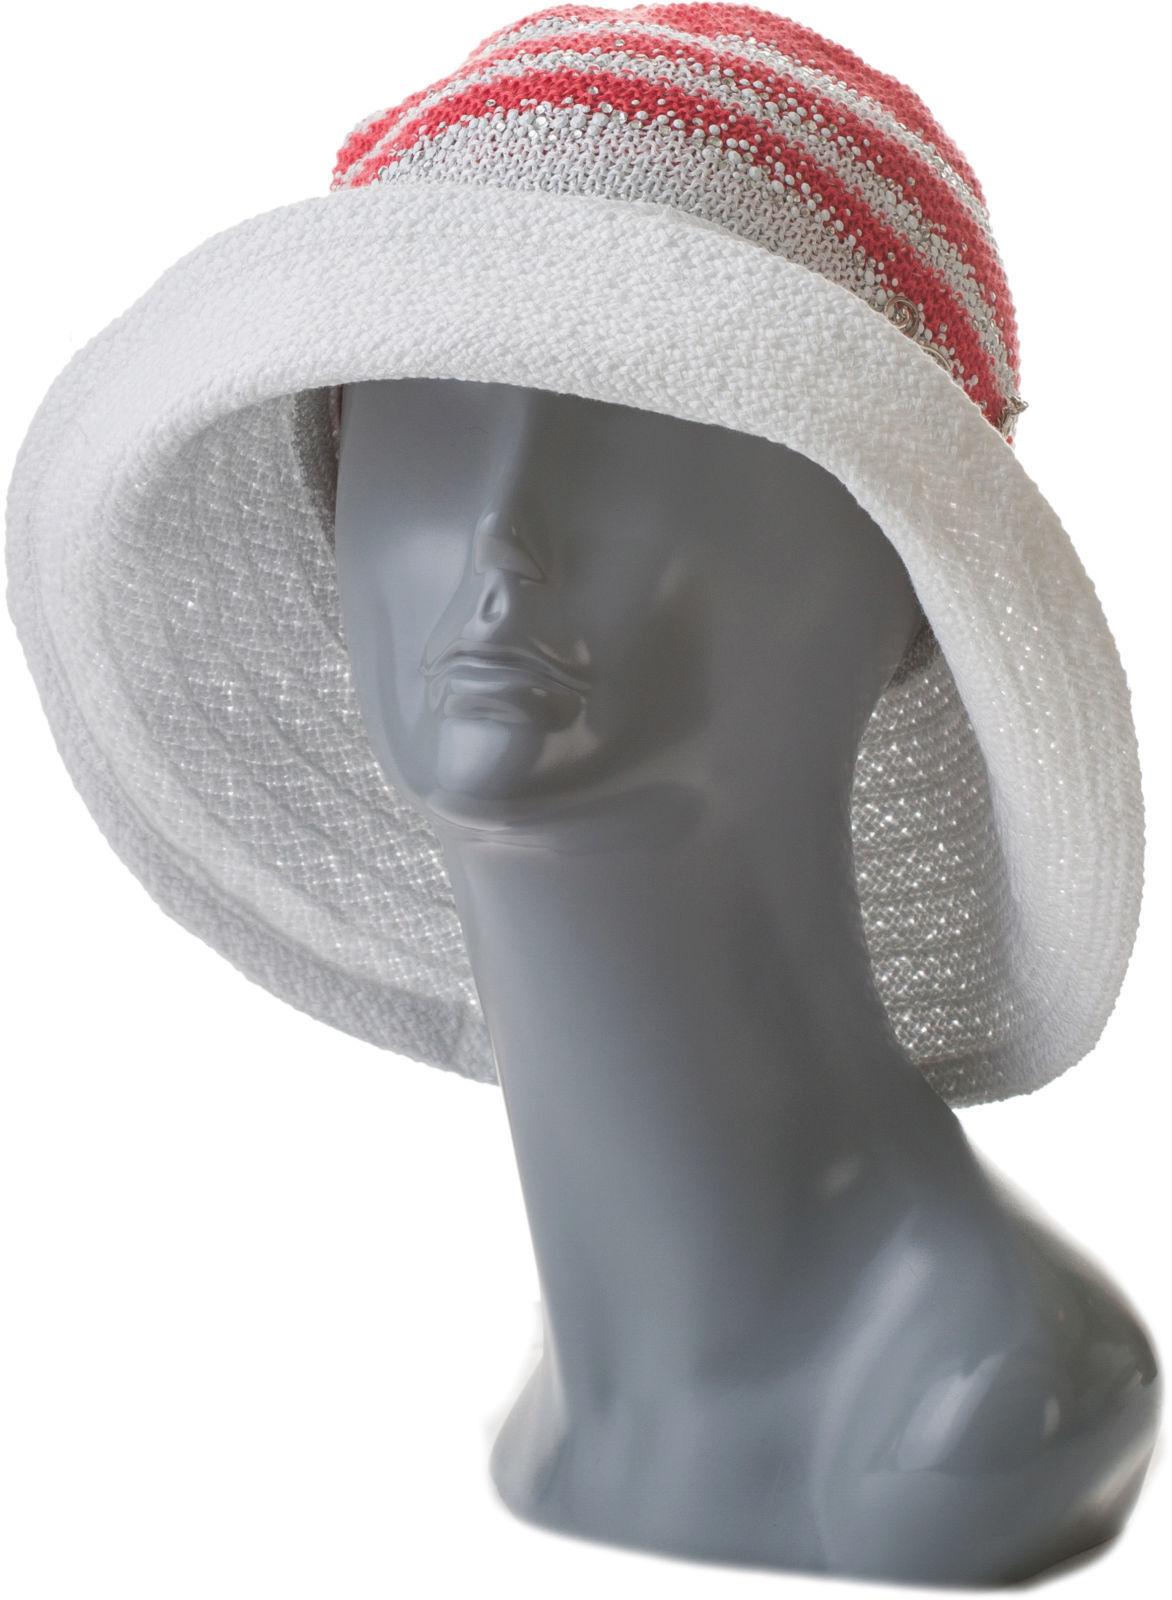 Шляпа летняя трикотажная с камнями